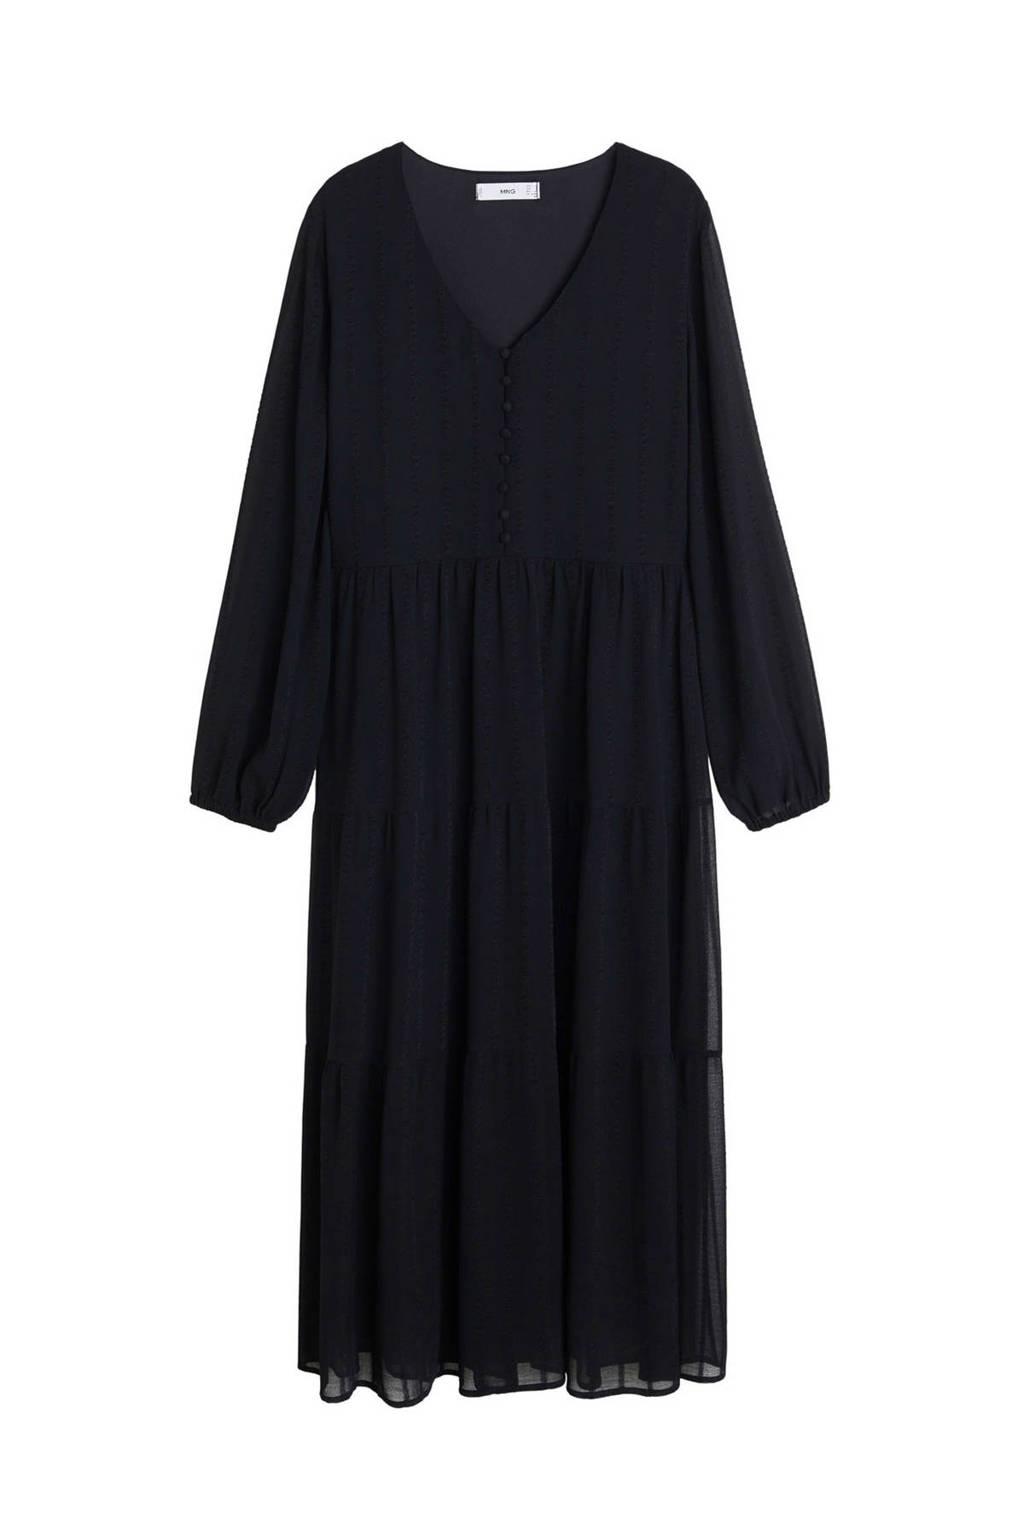 Mango semi-transparante jurk met borduursels zwart, Zwart